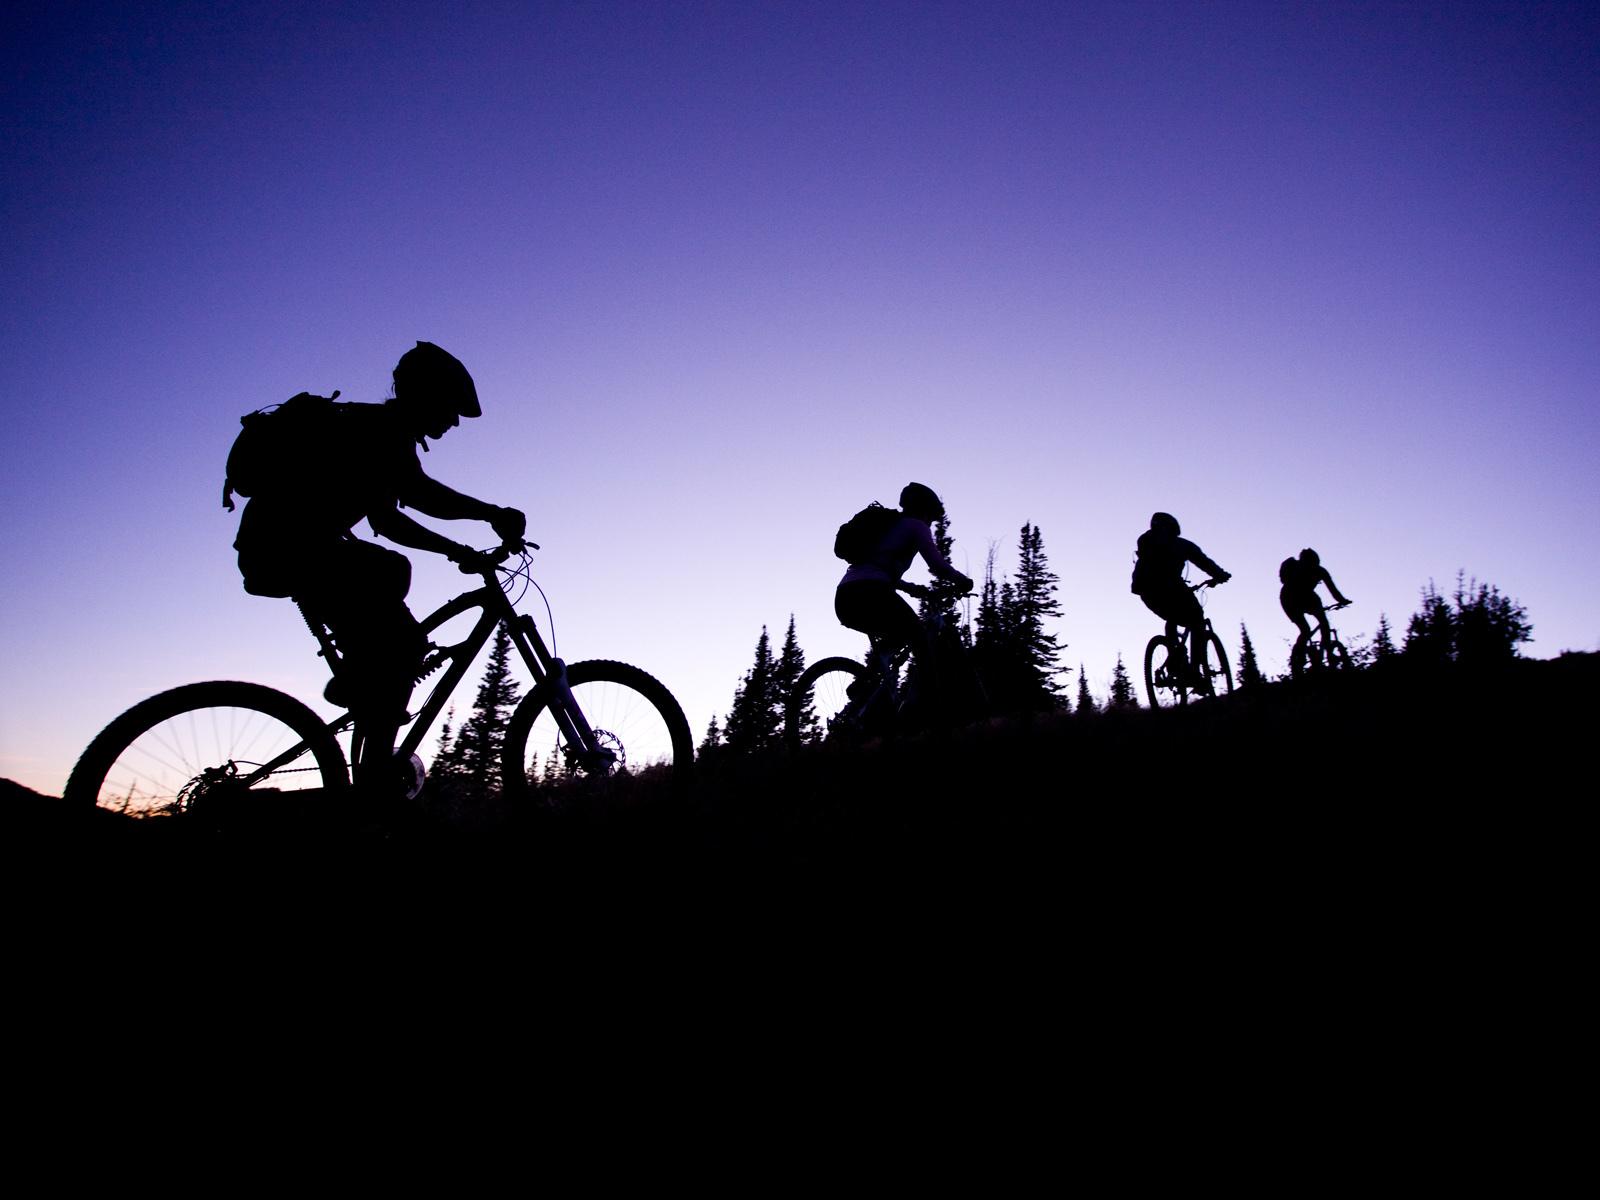 Mountain bike clip art free.